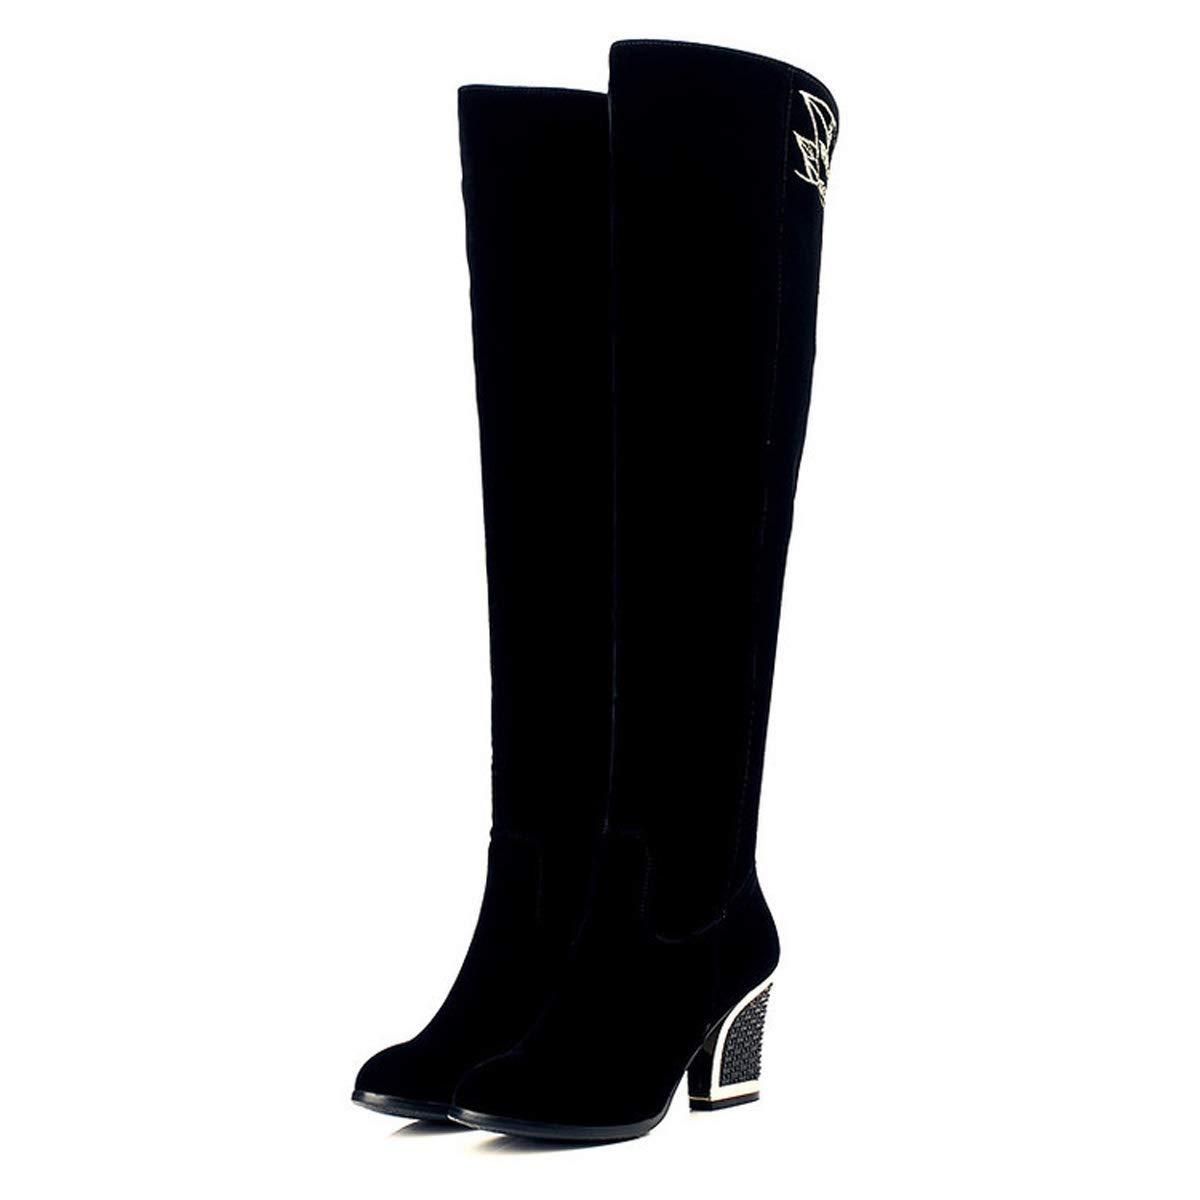 DANDANJIE Damen Stiefel Winter Bestickt Ethnic Vintage Style Overknee Stiefel Damen Blockabsatz No-Slip Stiefel Schwarz